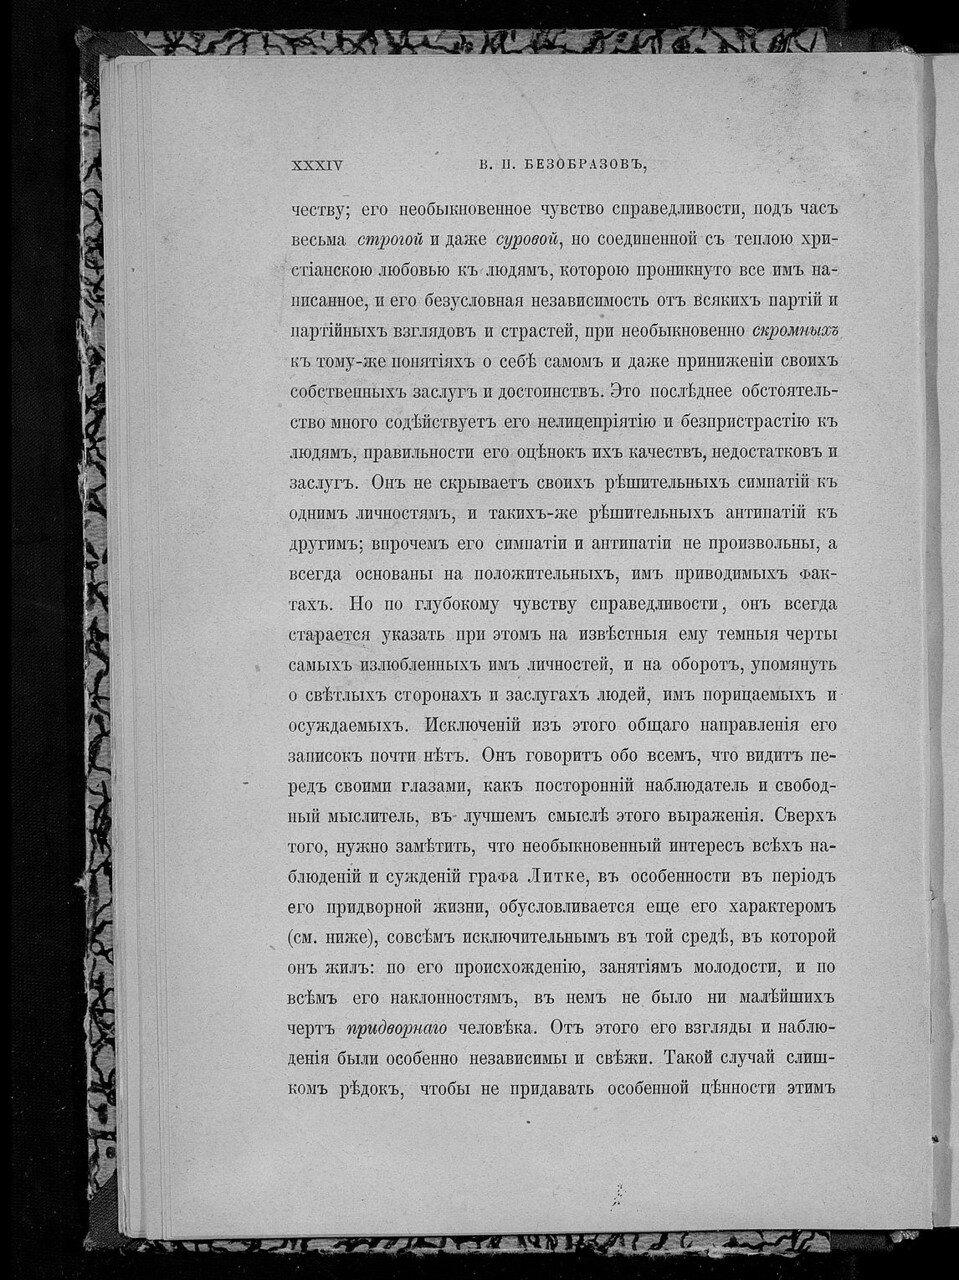 https://img-fotki.yandex.ru/get/27836/199368979.d2/0_21dd75_eddec167_XXXL.jpg